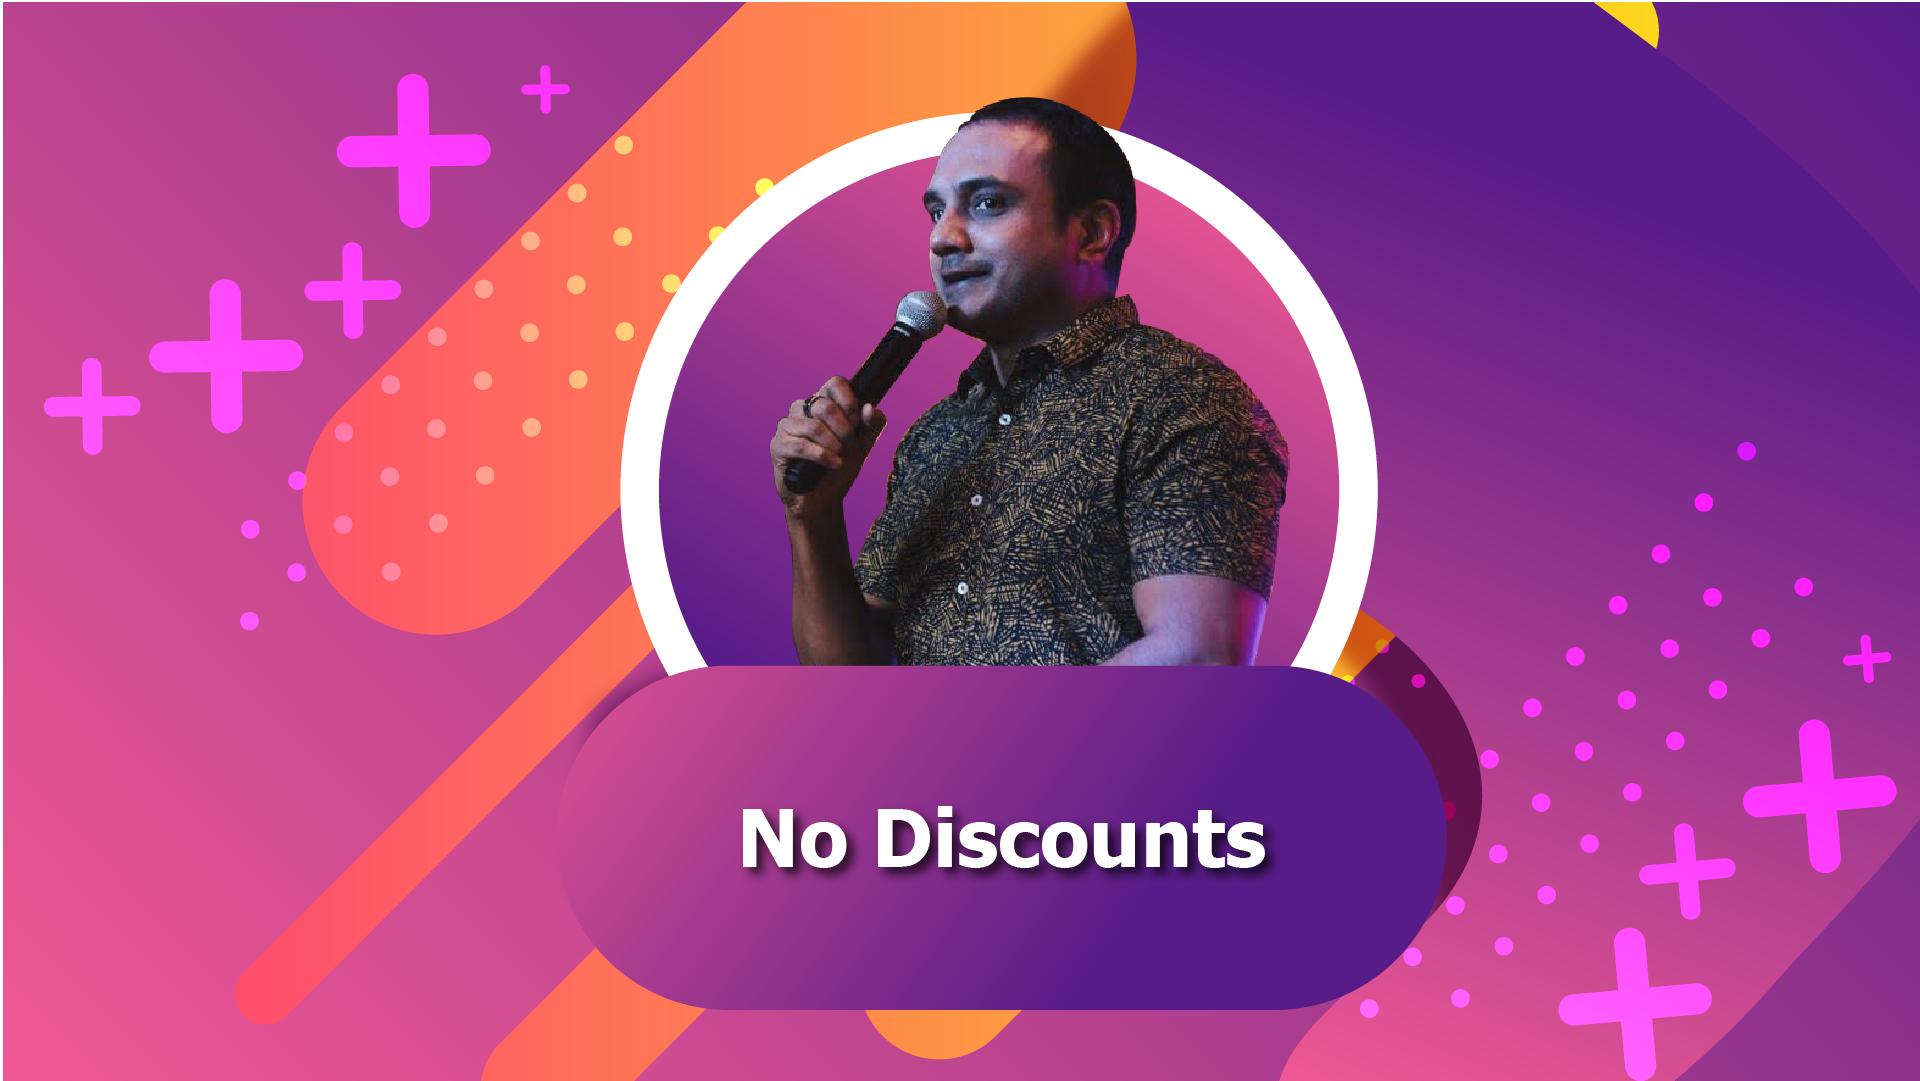 No Discounts